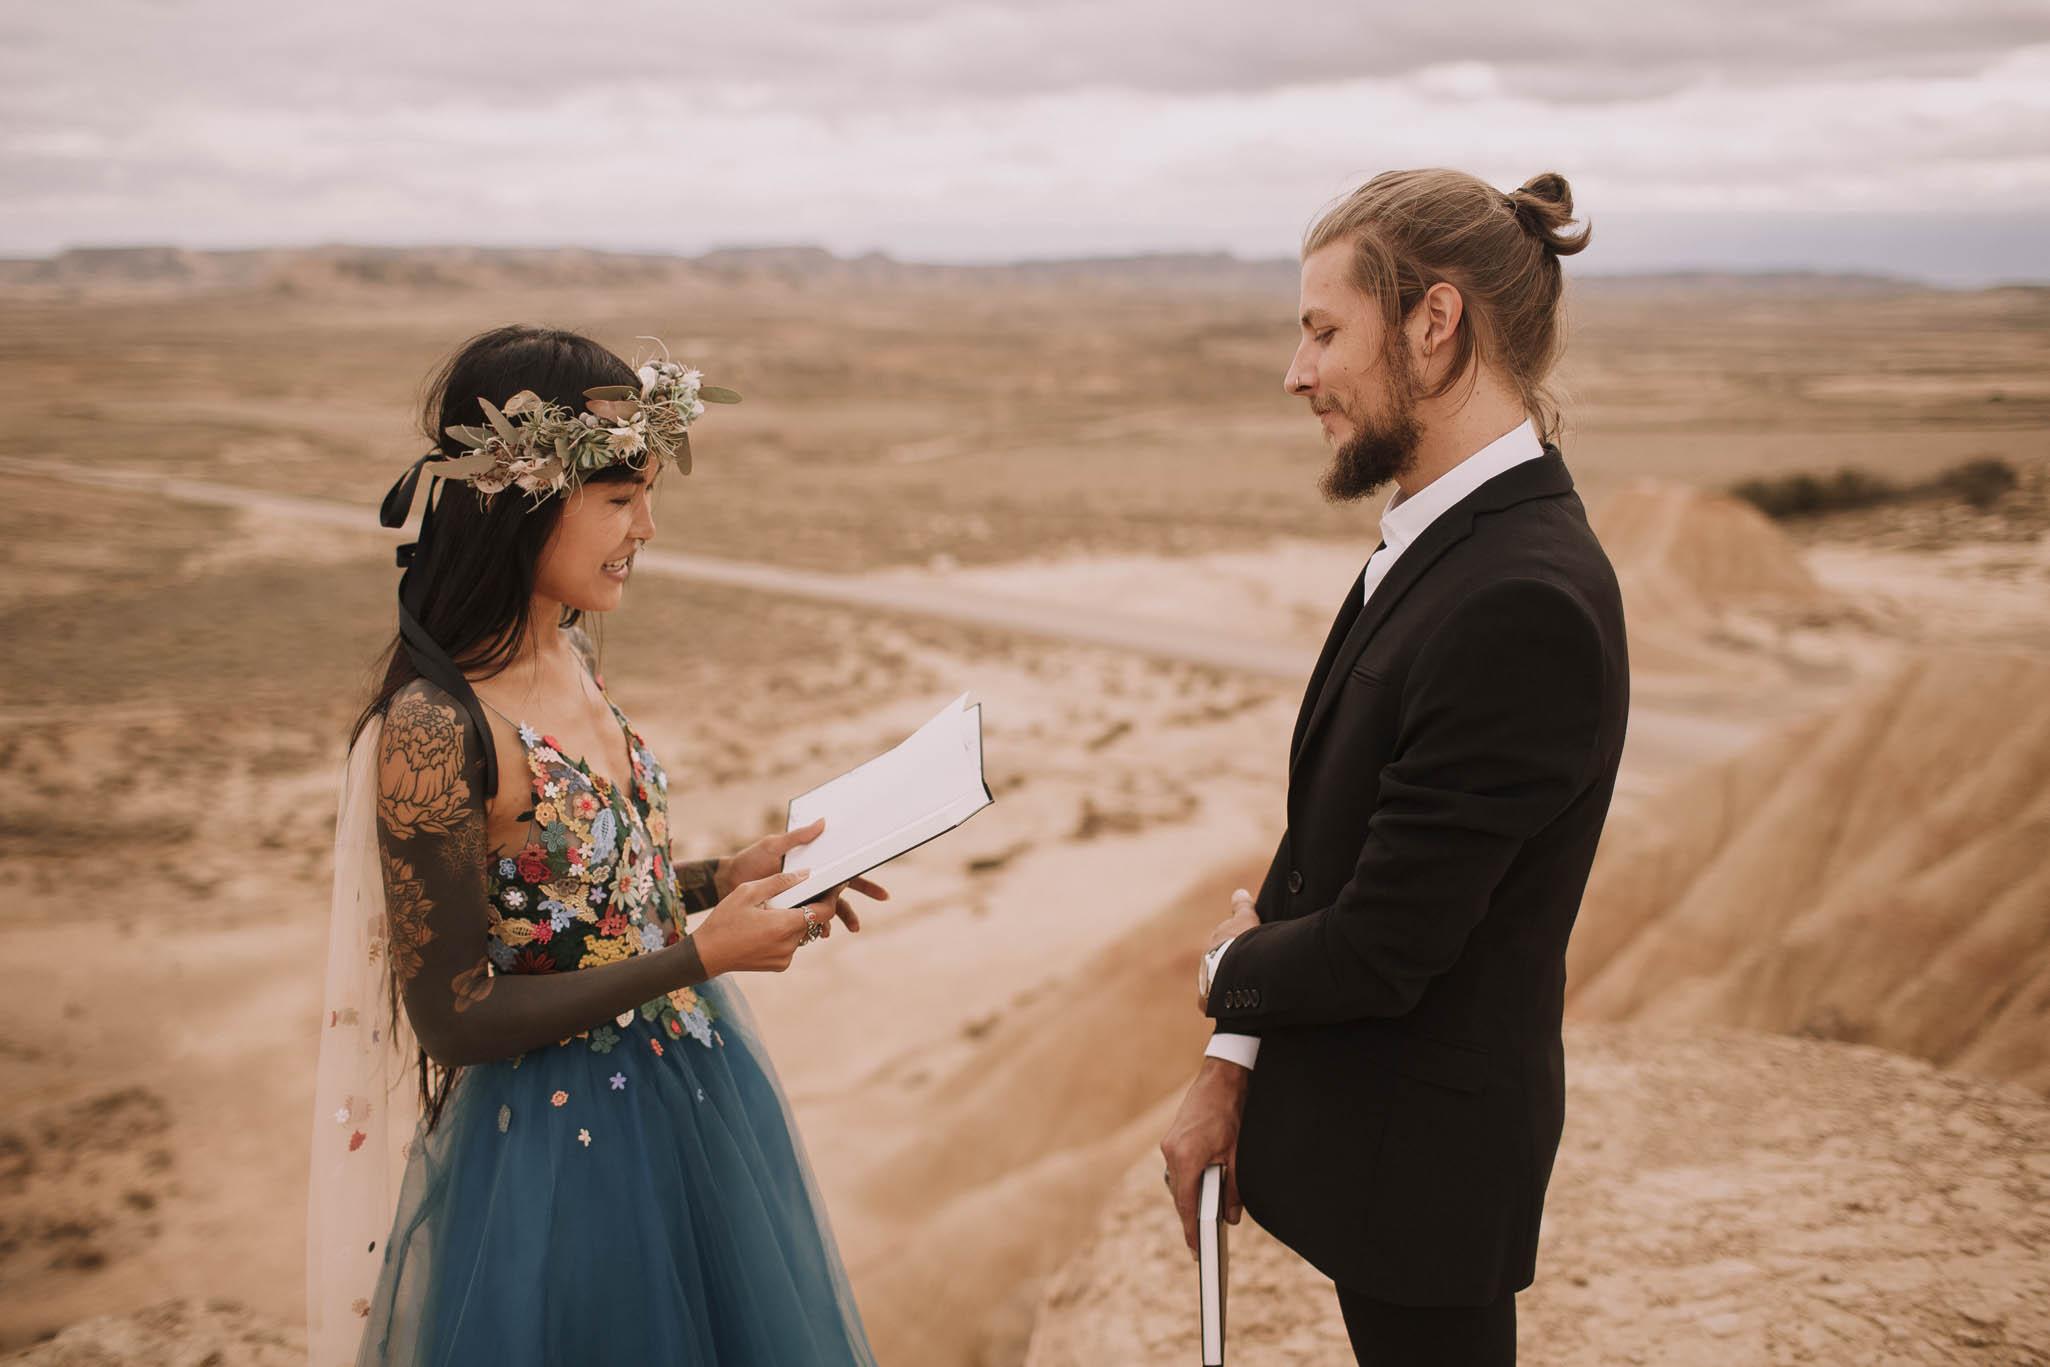 Spain-wedding-photographer-bardenas-reales-jeremy-boyer-photographe-mariage-bordeaux-floral-wedding-dress-robe-93.jpg